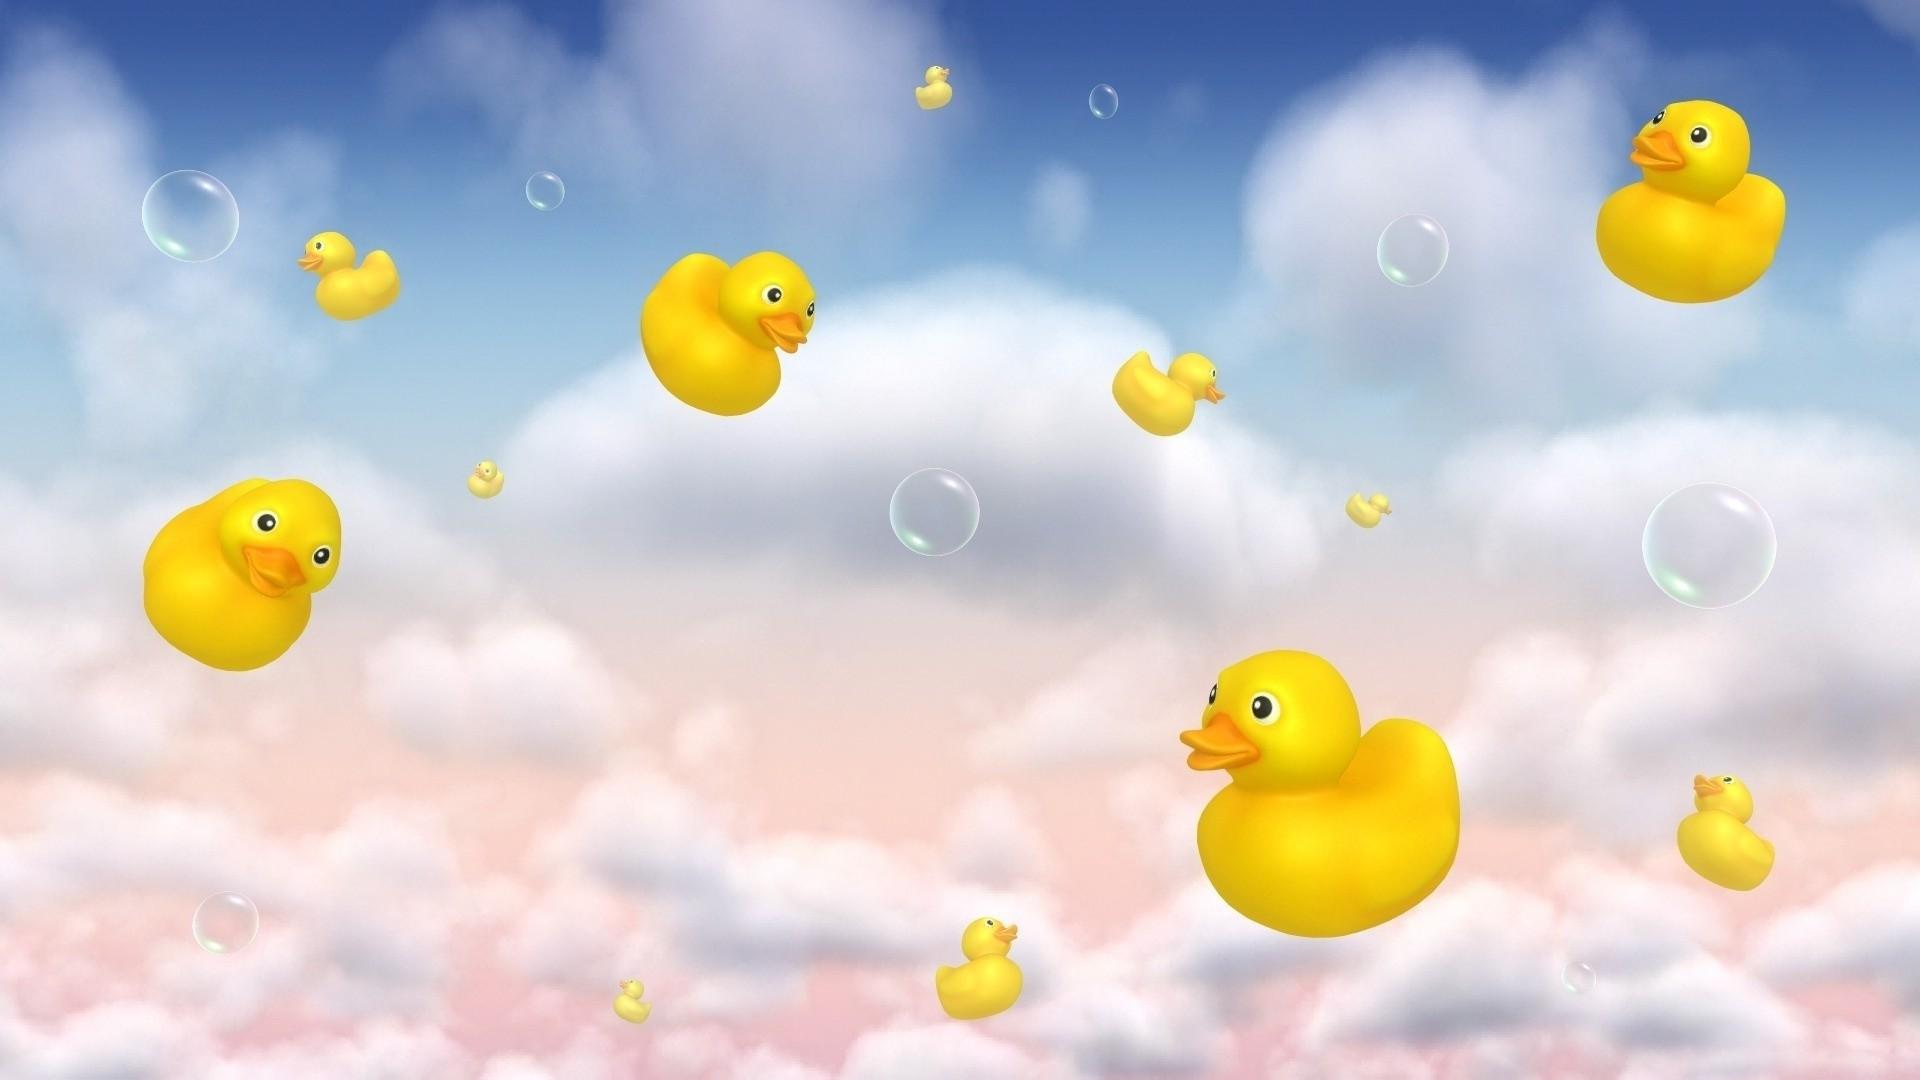 Rubber Duck Wallpaper 56 images 1920x1080